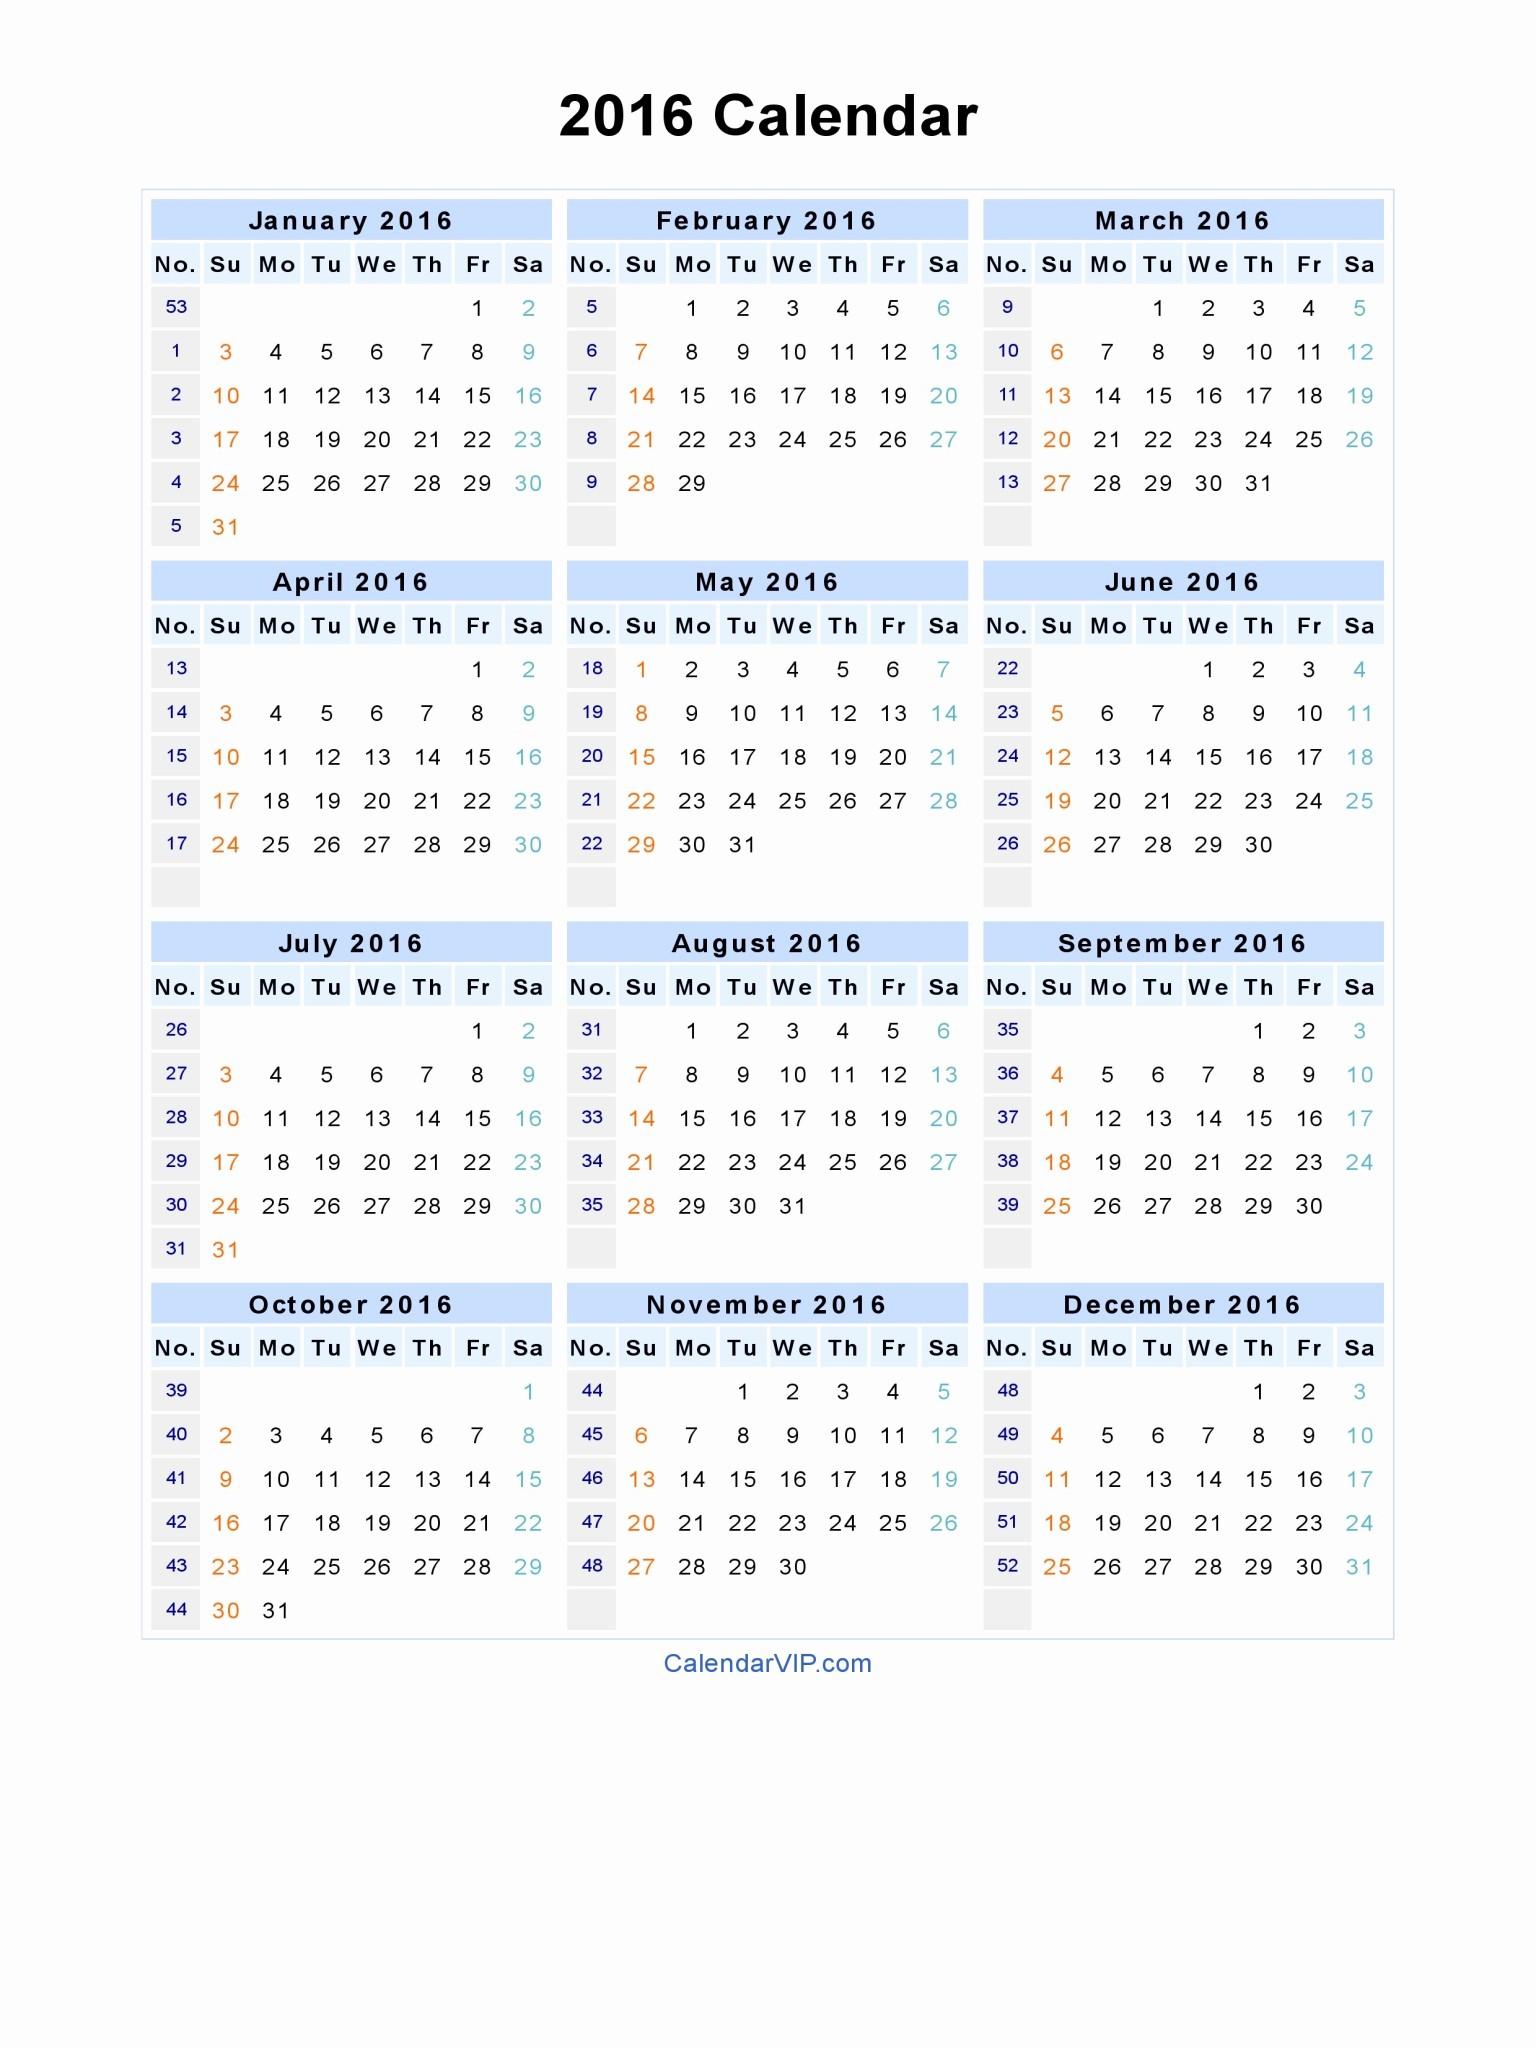 Calendar 2016 Printable with Holidays New 2016 Calendar Blank Printable Calendar Template In Pdf